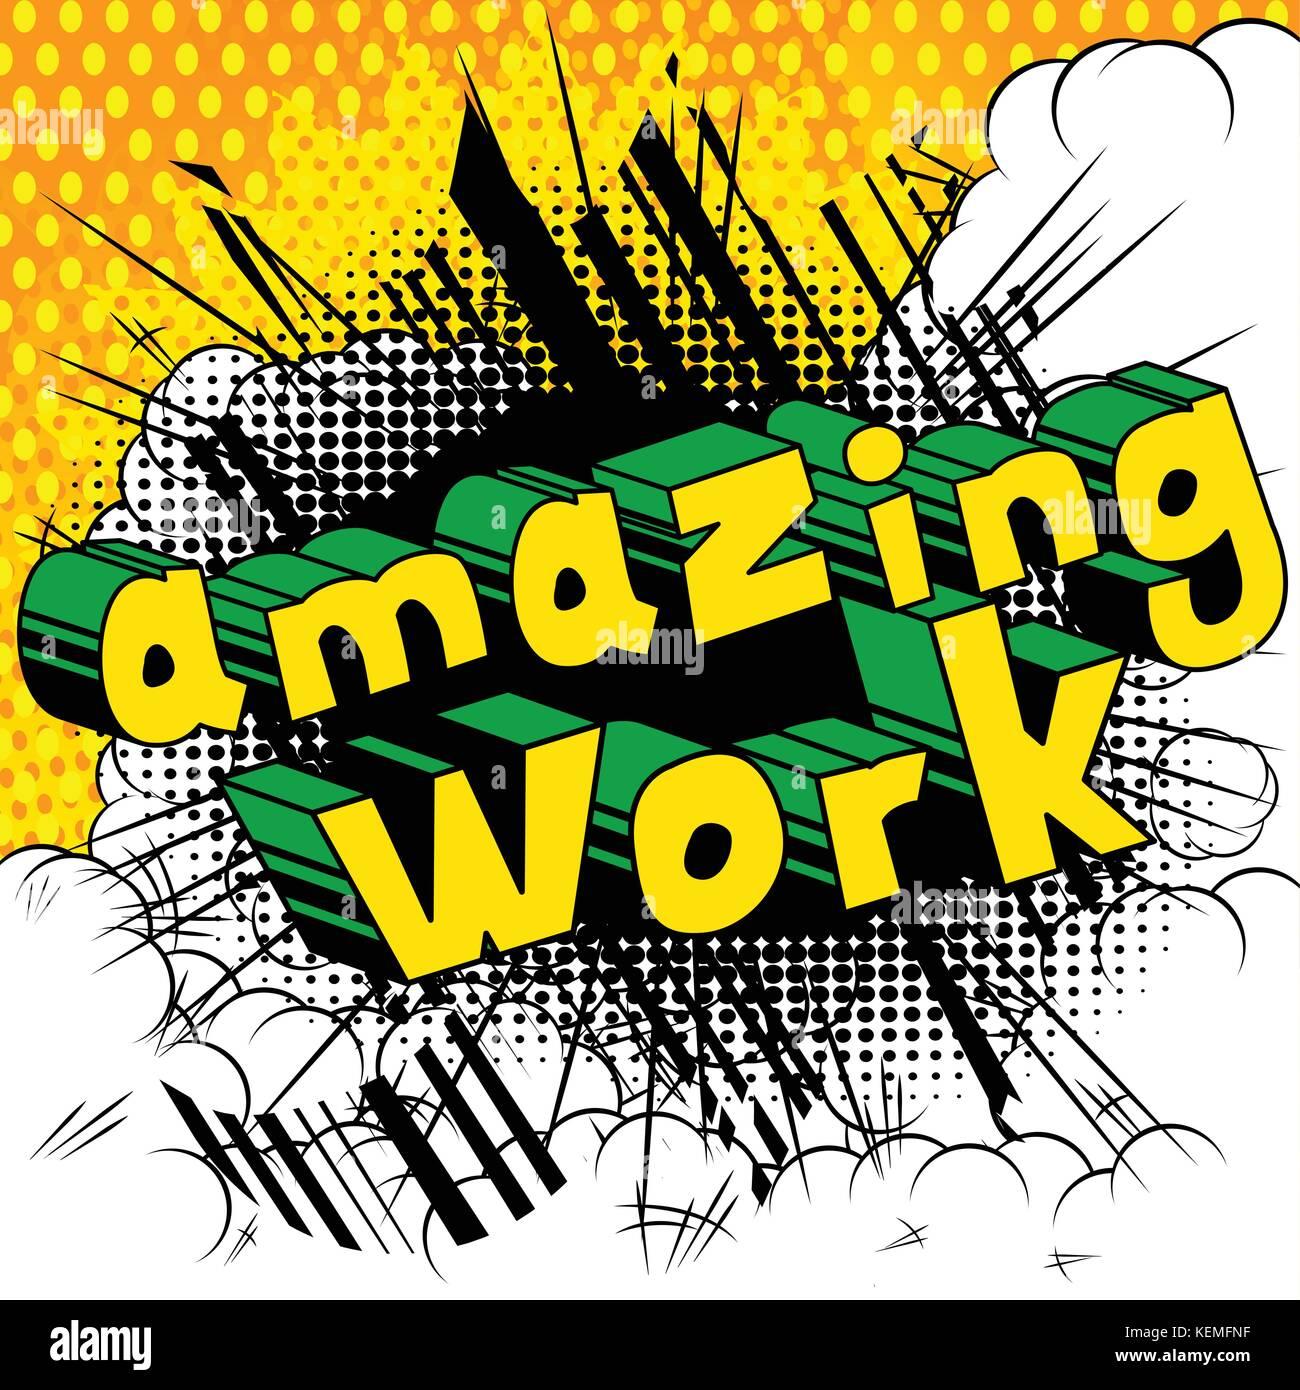 amazing work comic book